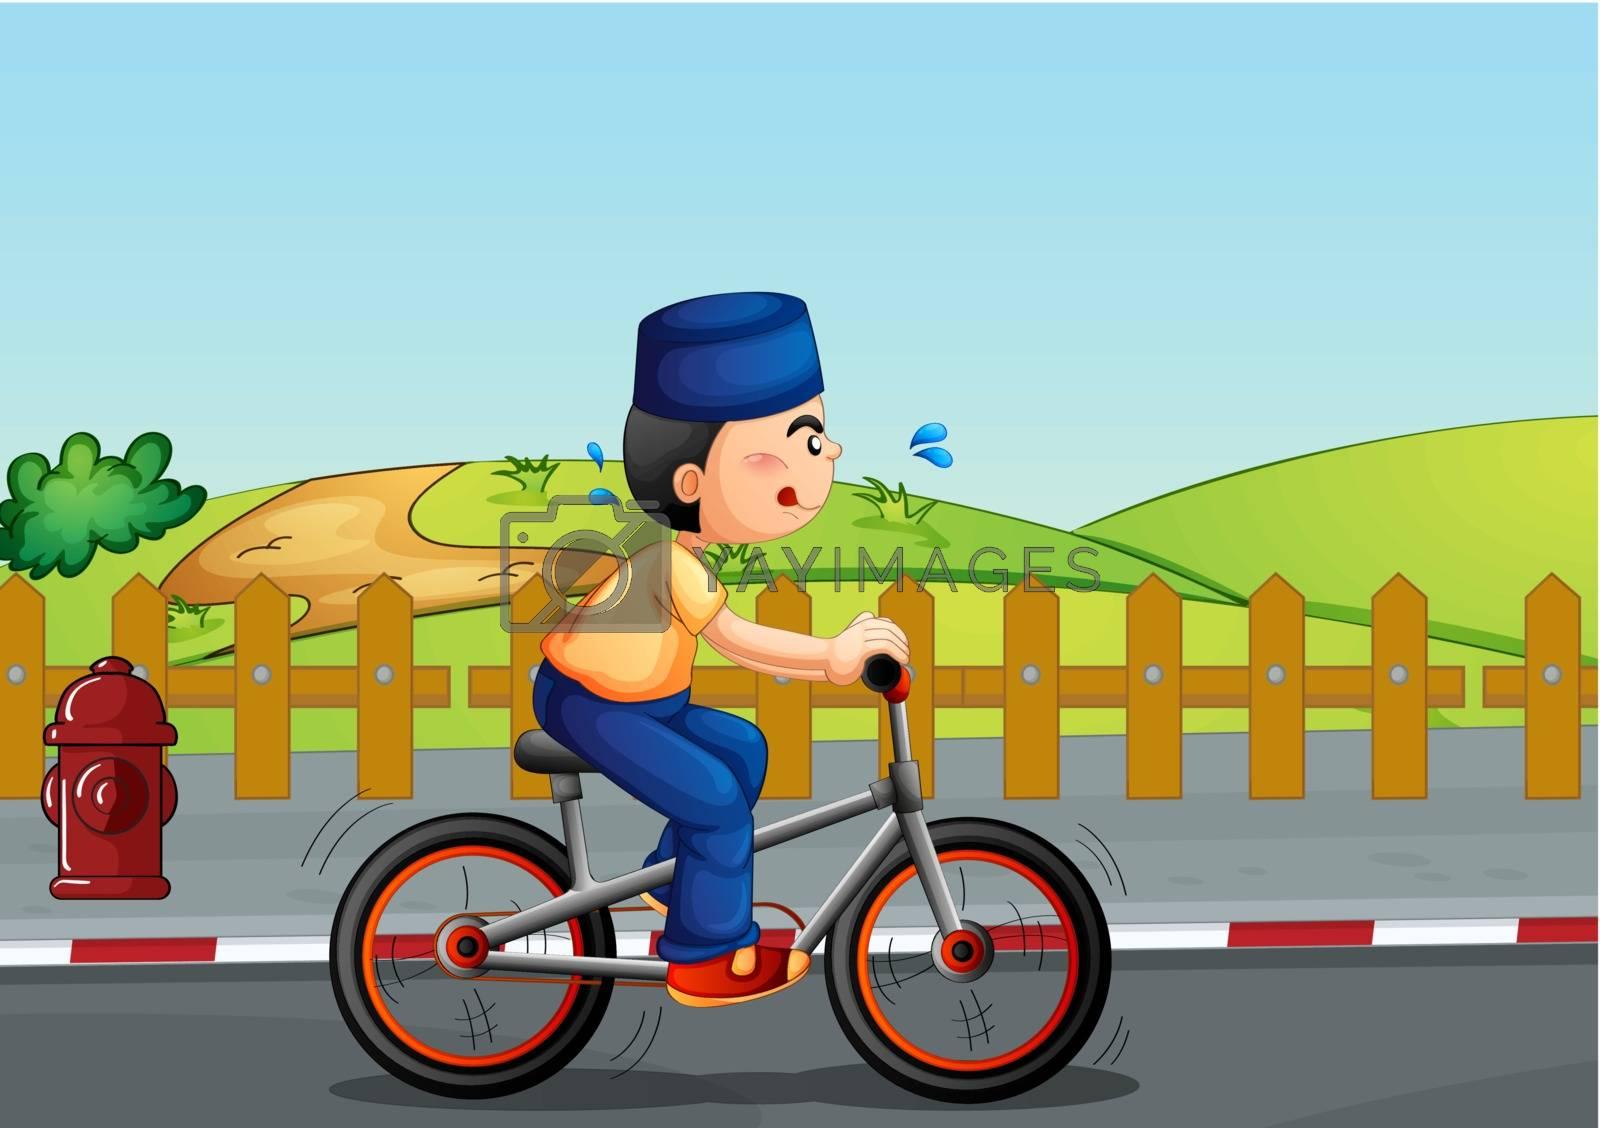 Illustration of a sweaty muslim riding on a bike